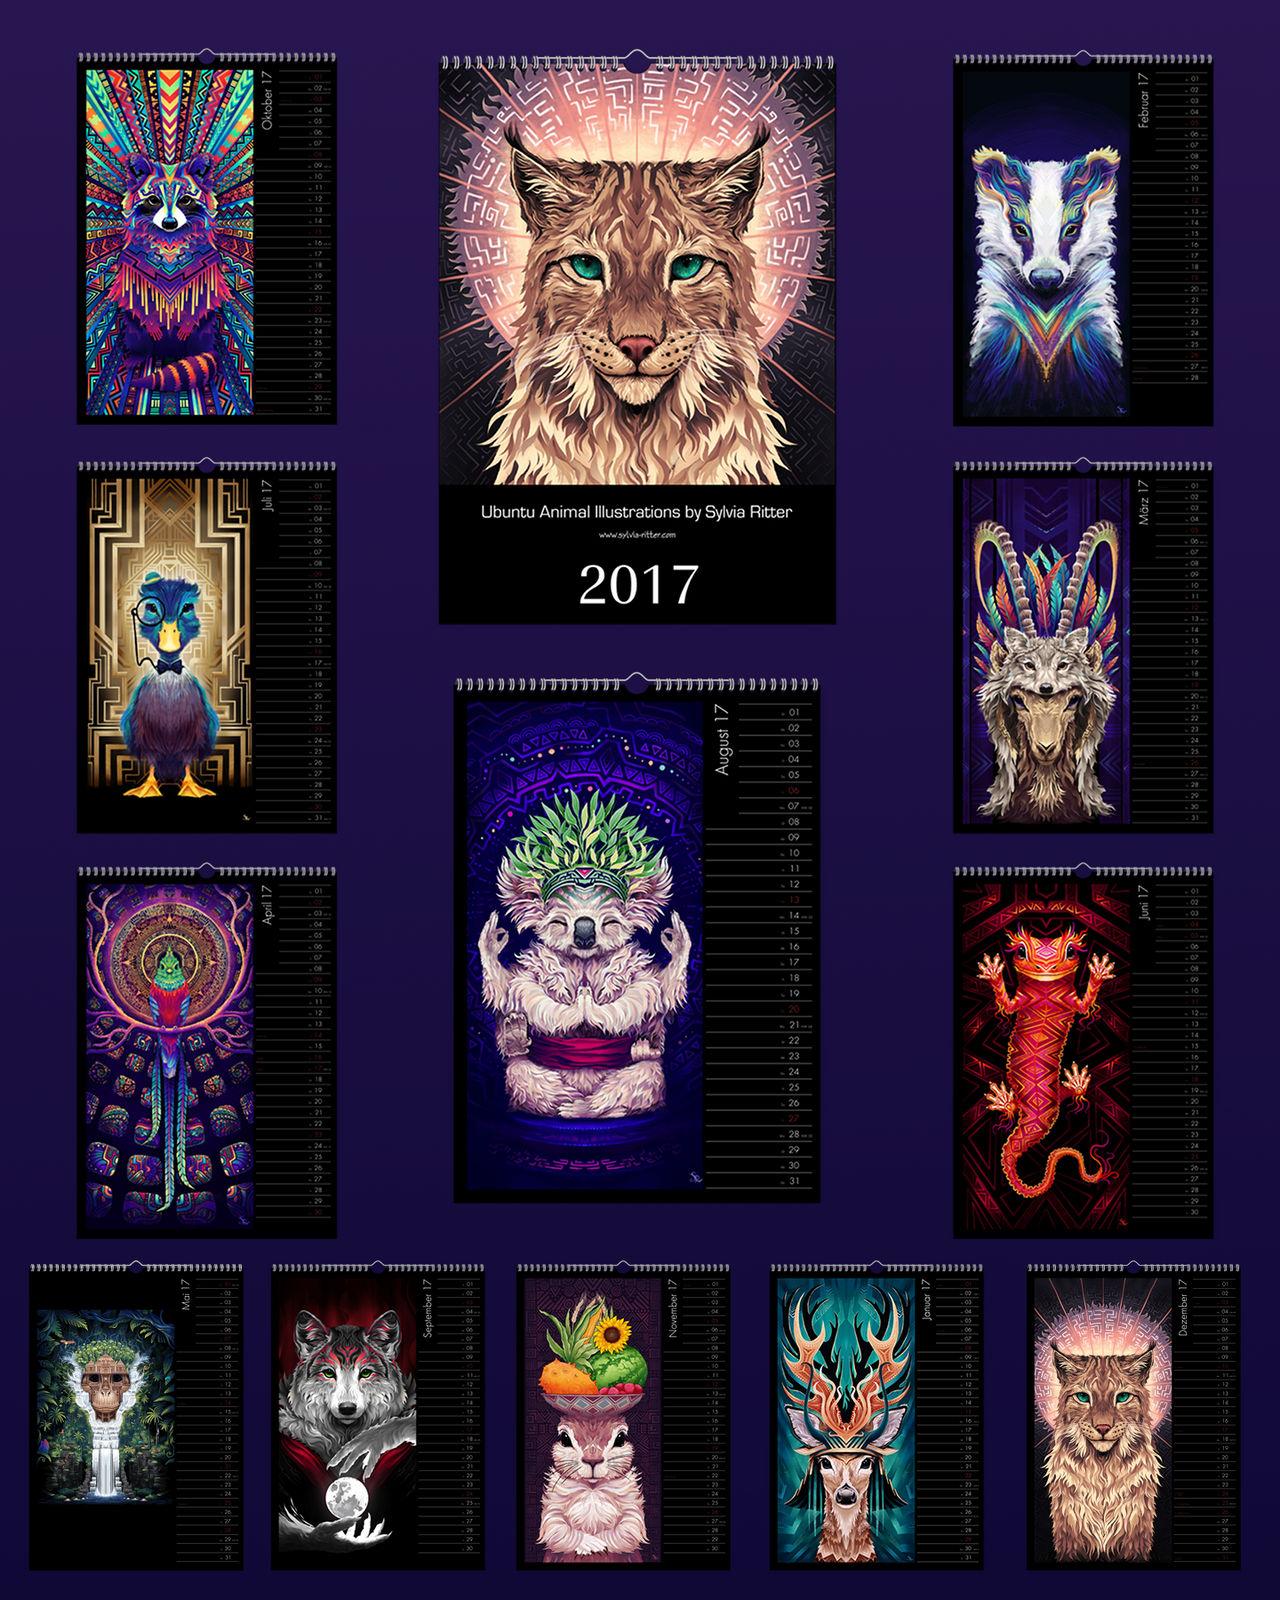 Ubuntu Animal Illustrations Calendar 2017